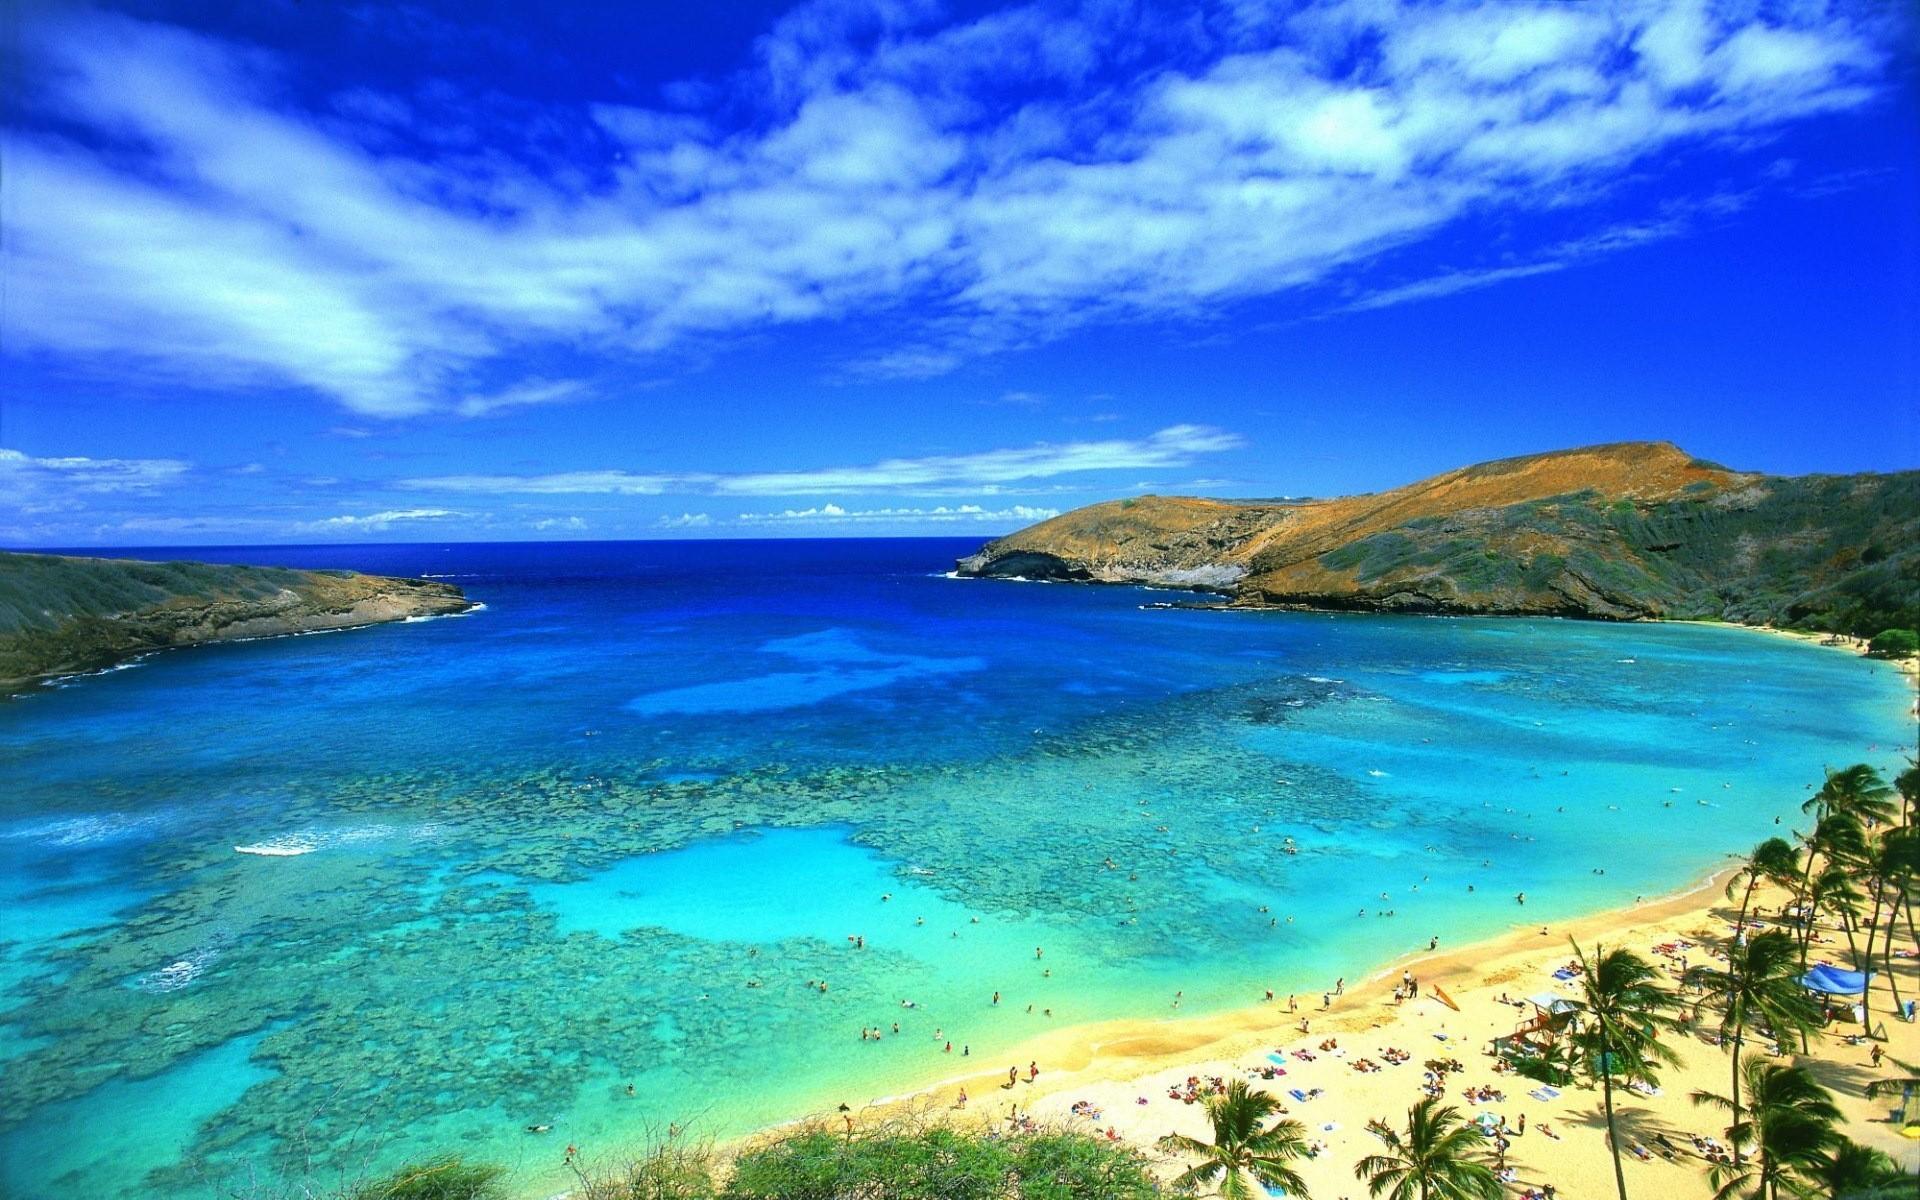 Stunning Hawaii Wallpaper